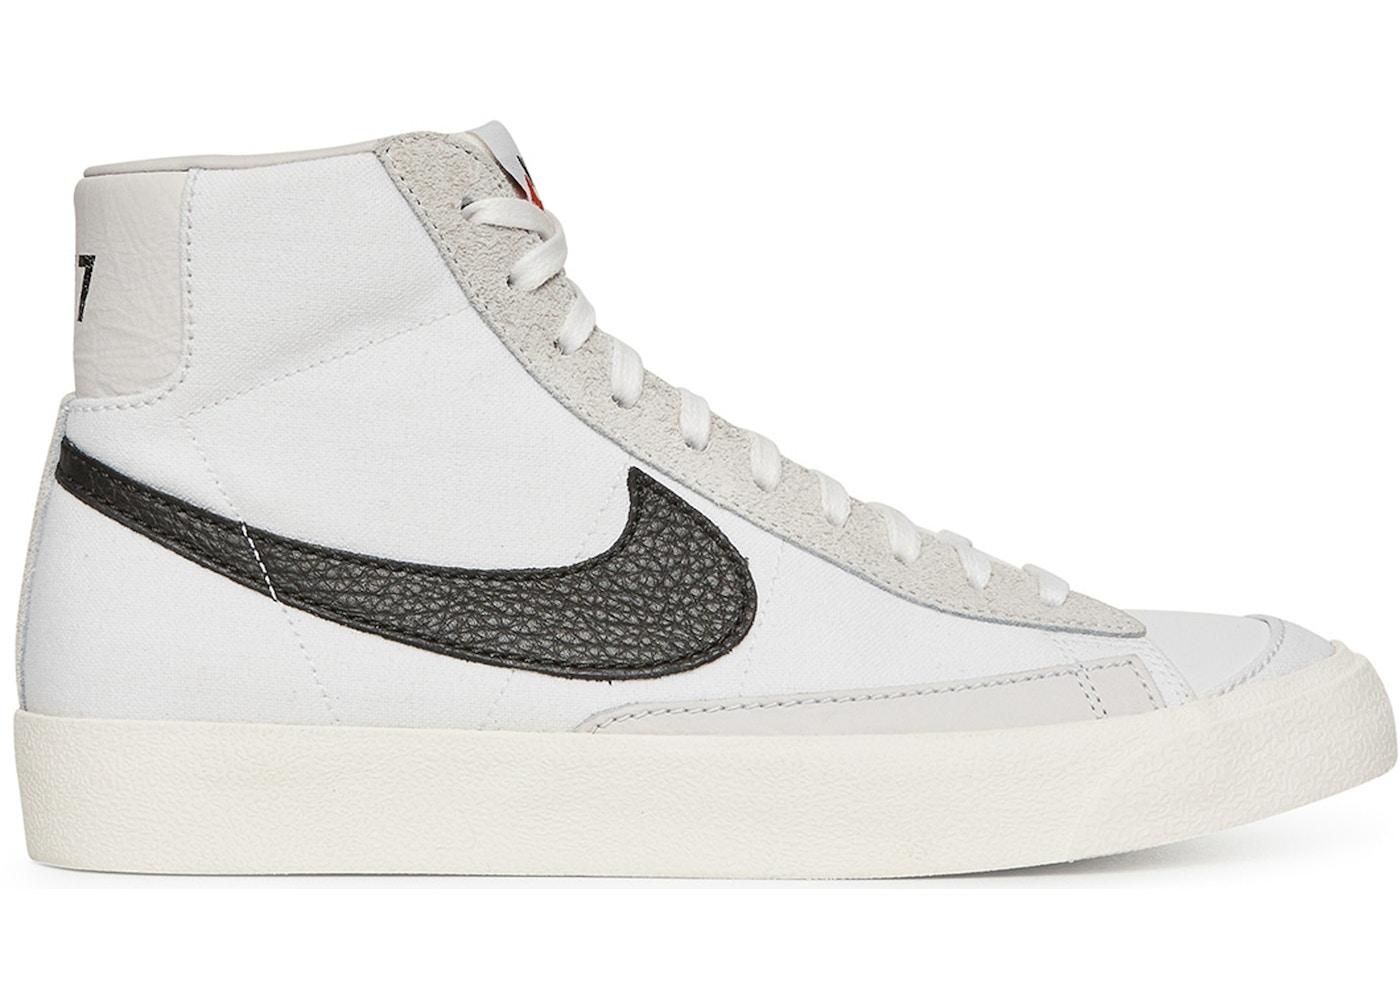 Nike Blazer Mid 77 Vintage Slam Jam - TBD a6a8725eb472